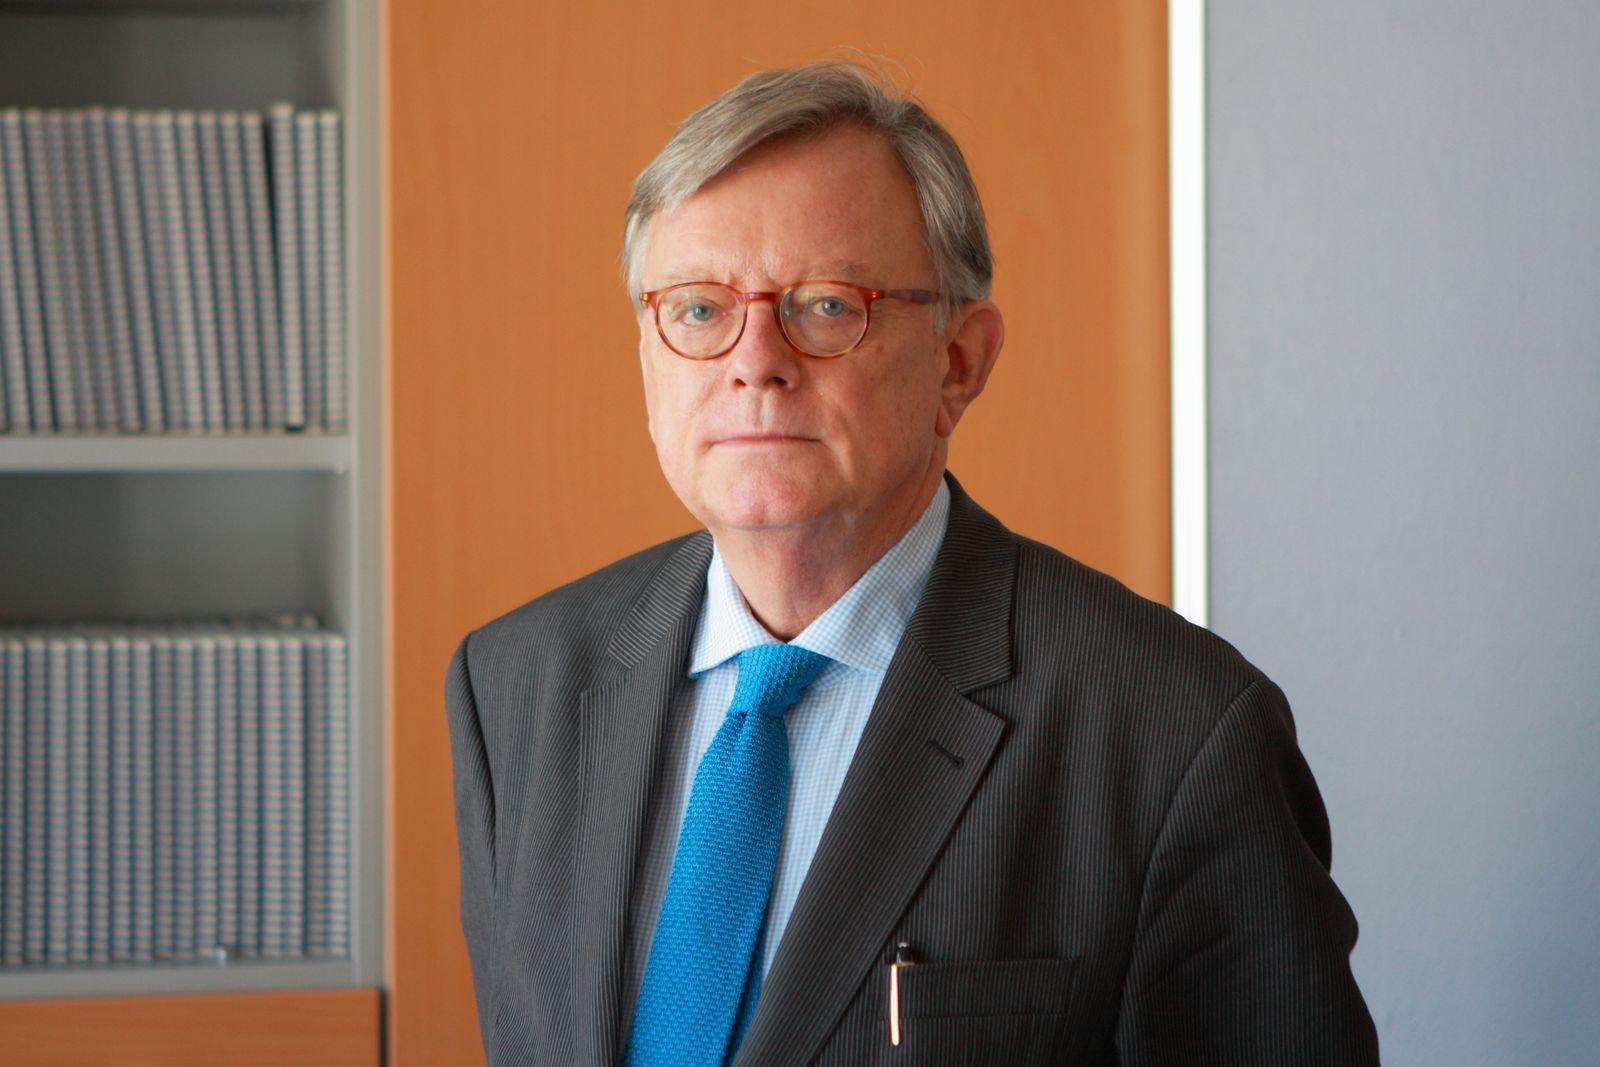 Professor Dr. Ludwig Salgo